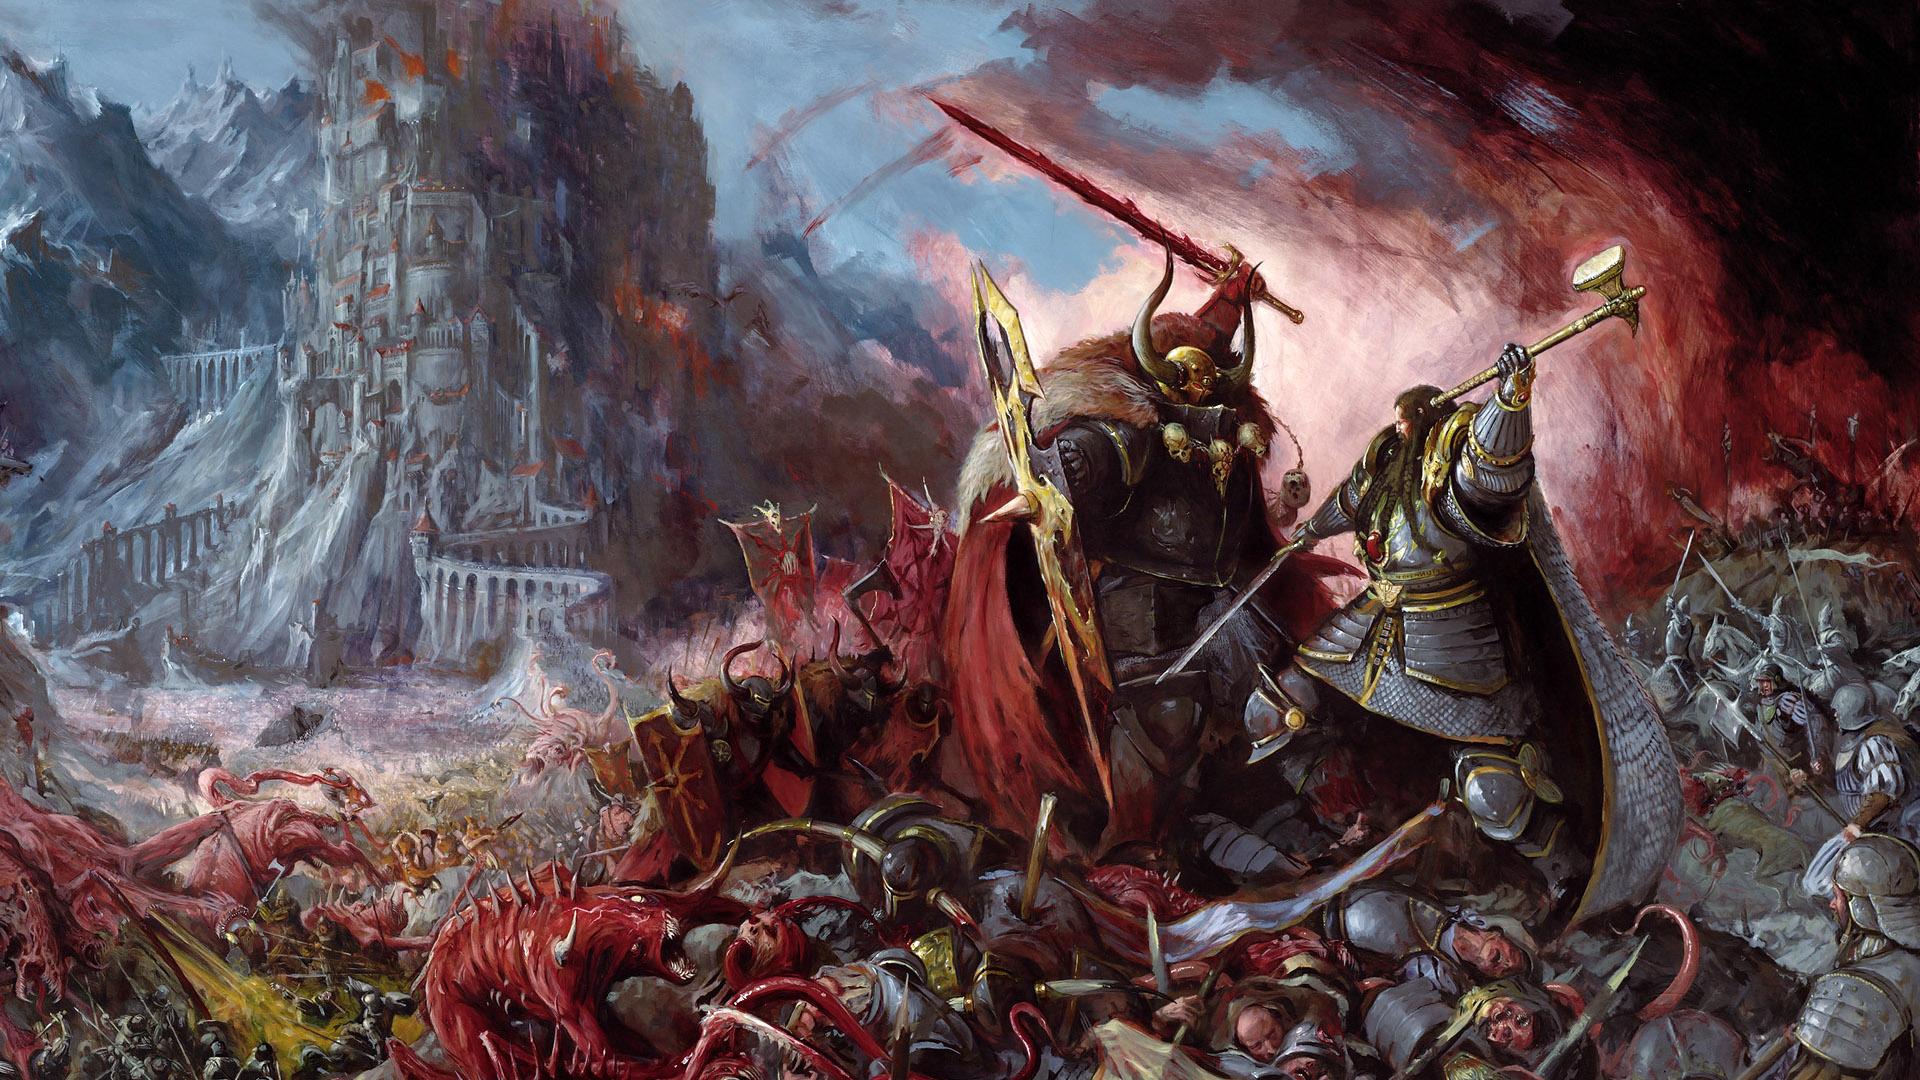 Free Download The Art Of War Hd Fantasy Battle Scene Wallpapers Fantasy 1920x1080 For Your Desktop Mobile Tablet Explore 47 Battle Wallpaper Space Battle Wallpaper